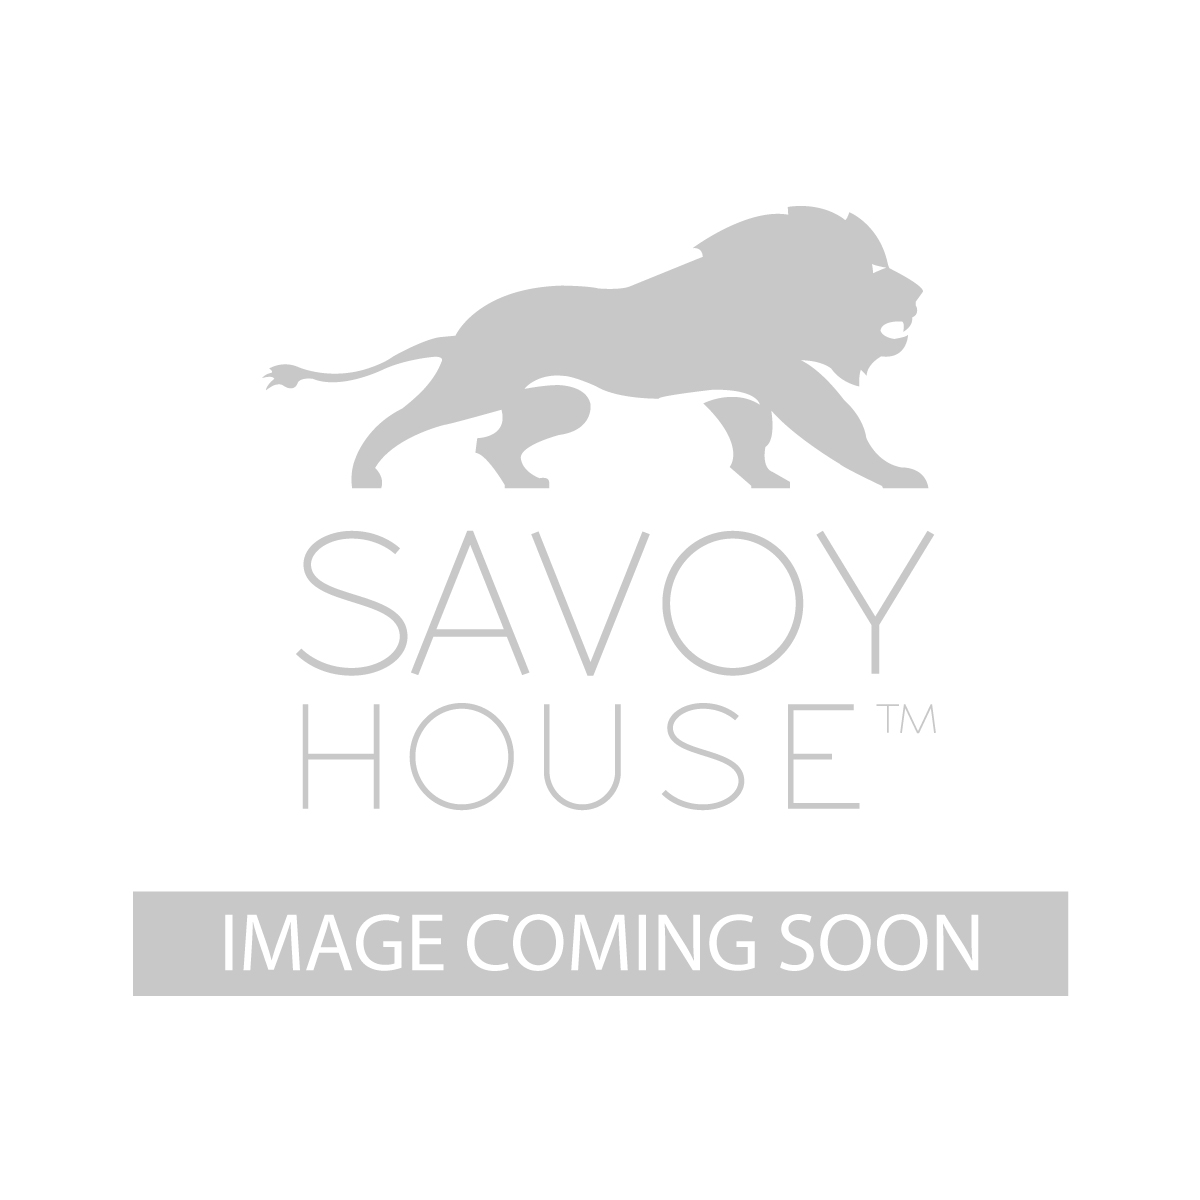 8-9070-3-13 Jordan 3 Light Bath Bar by Savoy House